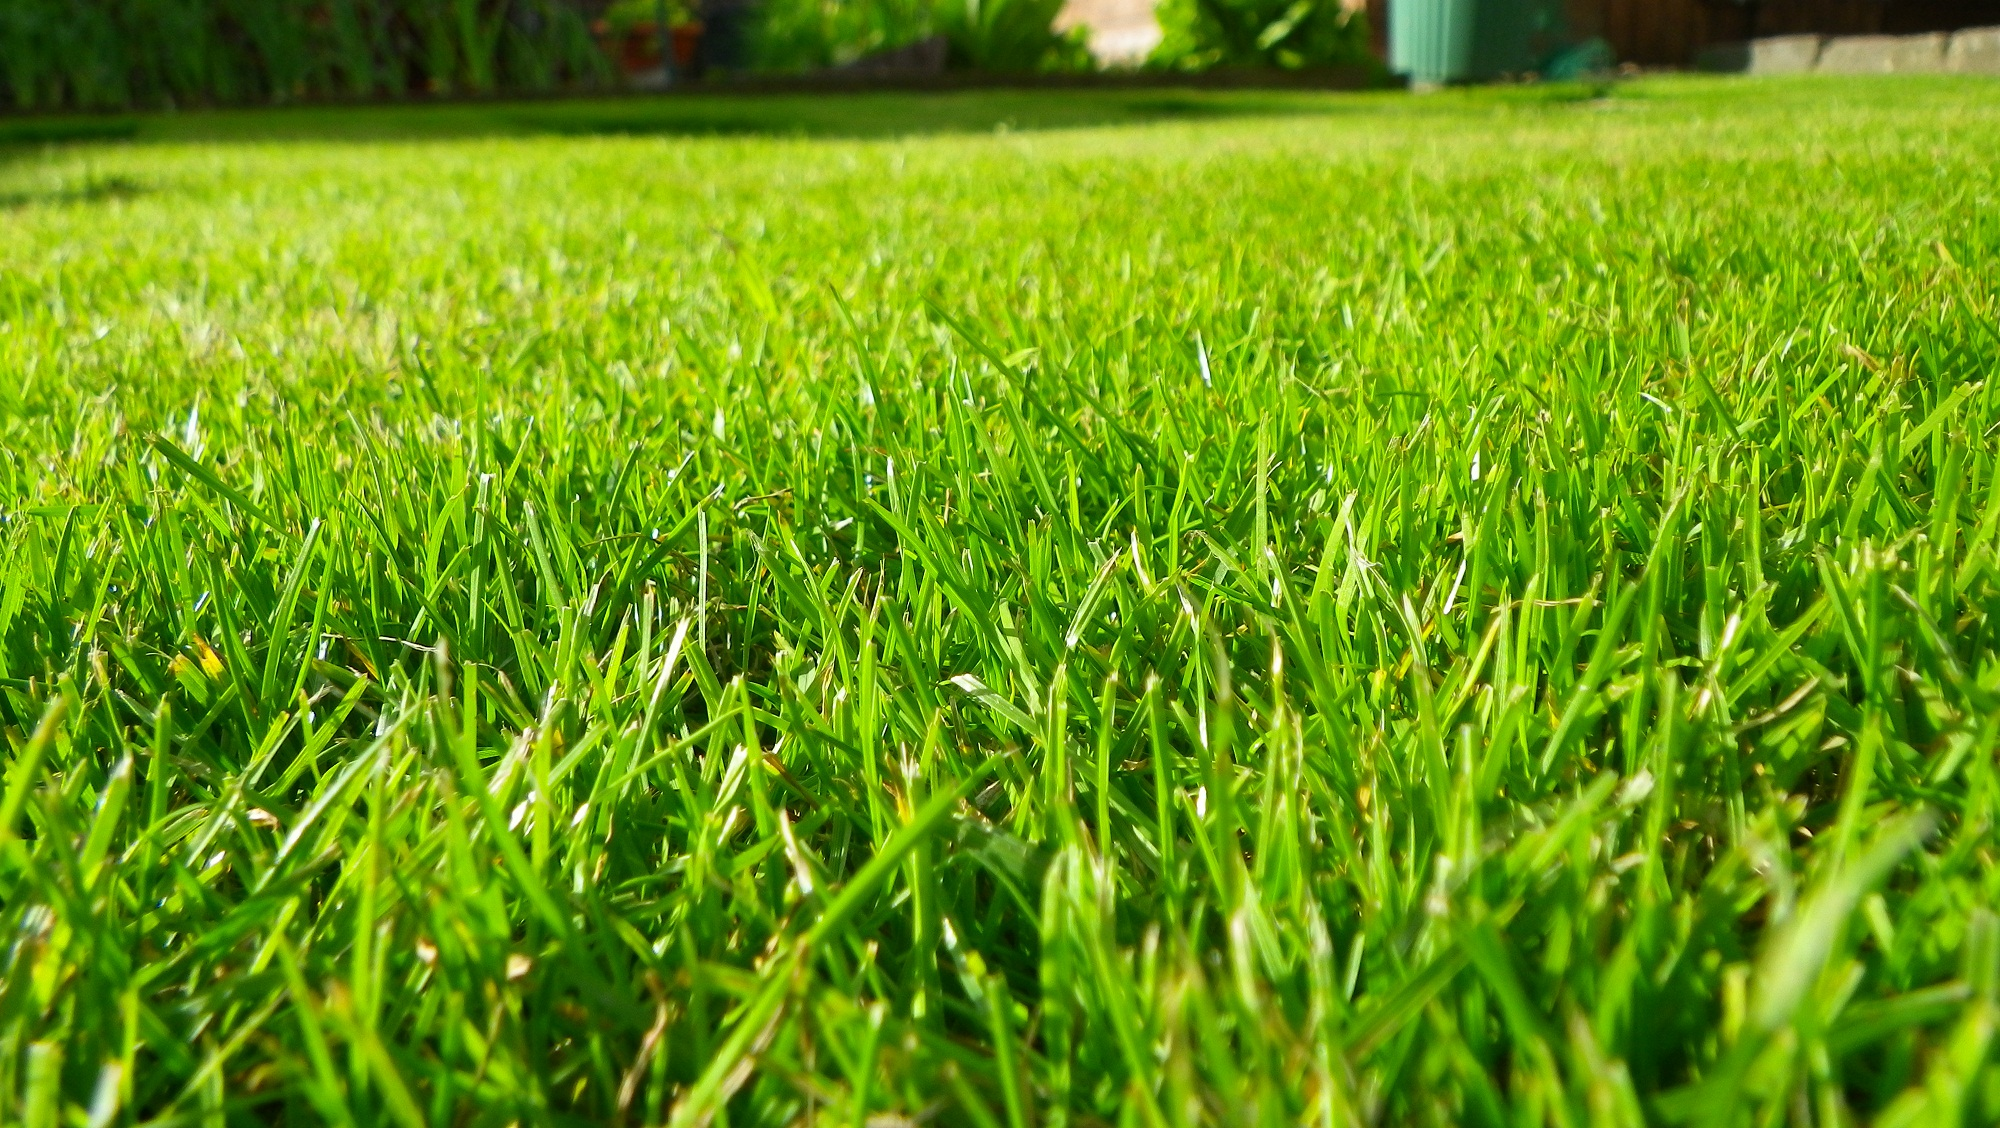 Glasgow grass cutting